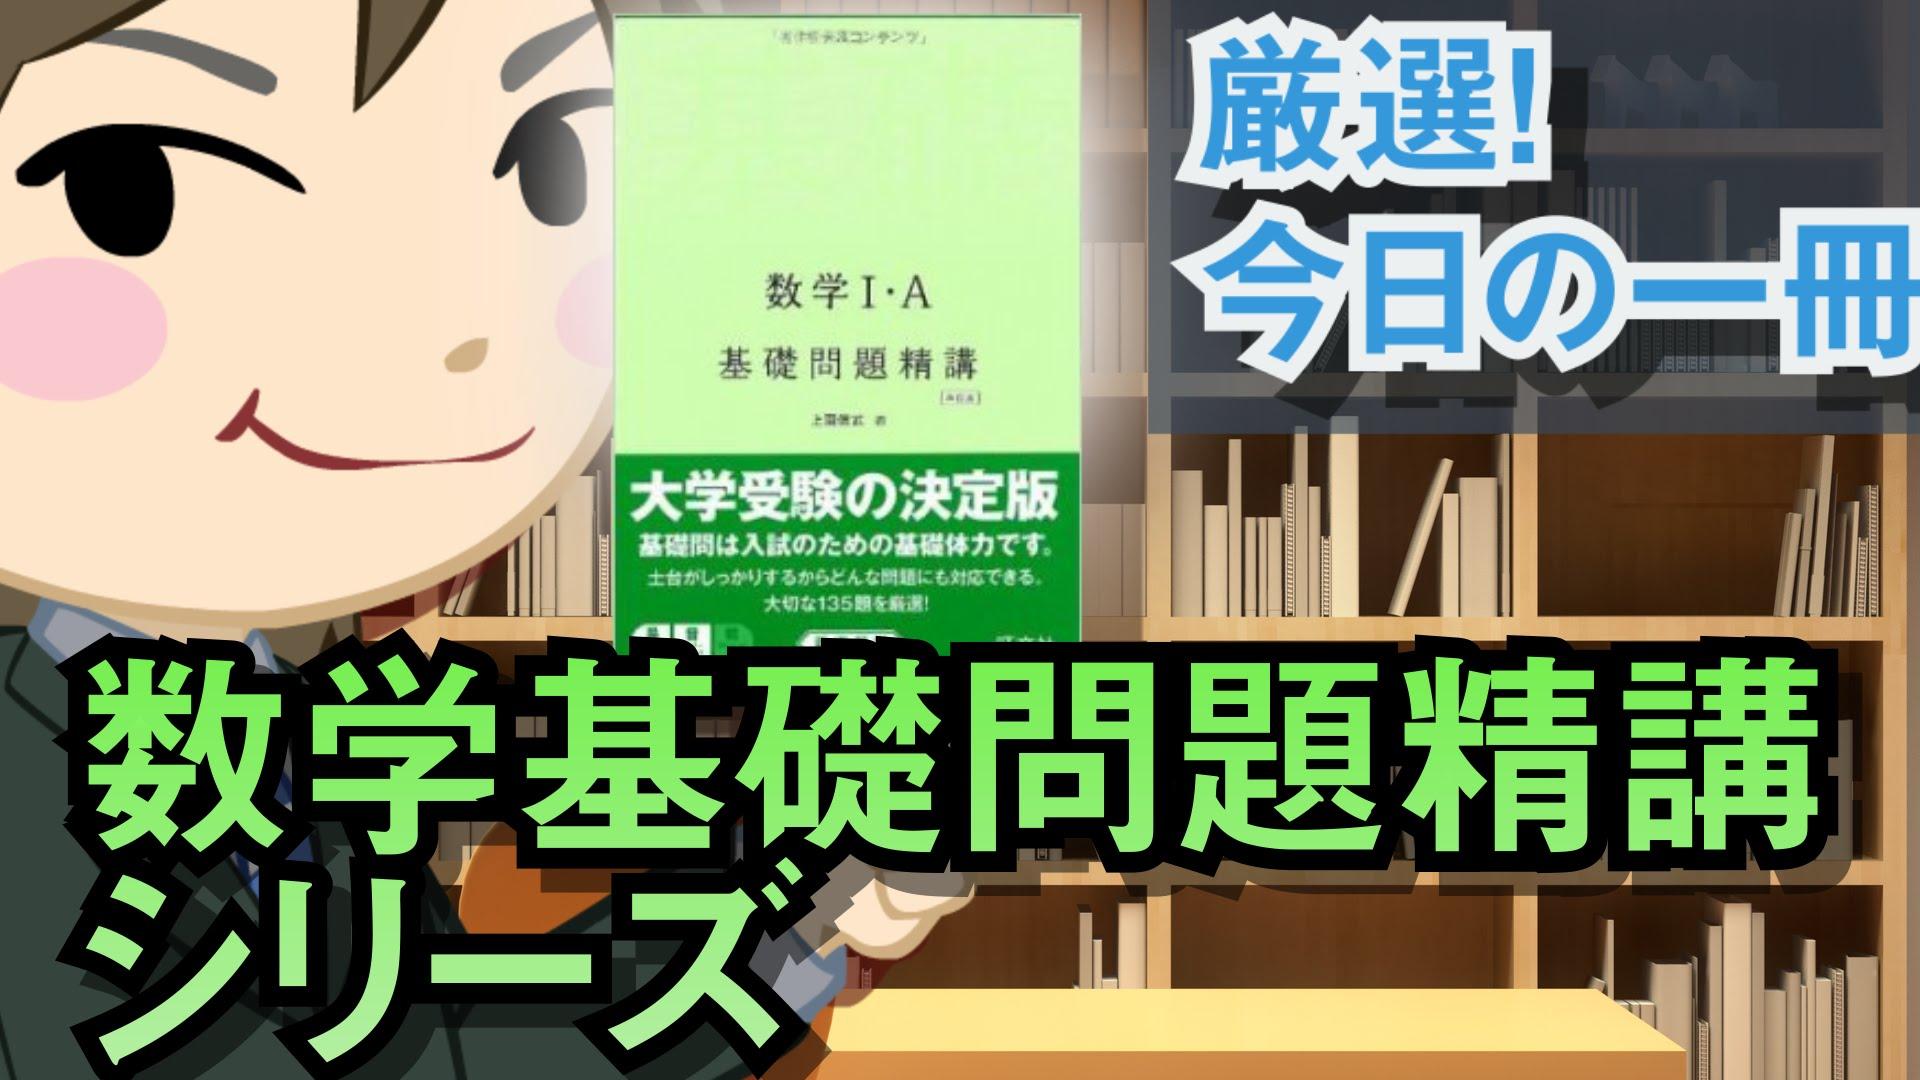 数学基礎問題精講シリーズ|武田塾厳選!今日の一冊